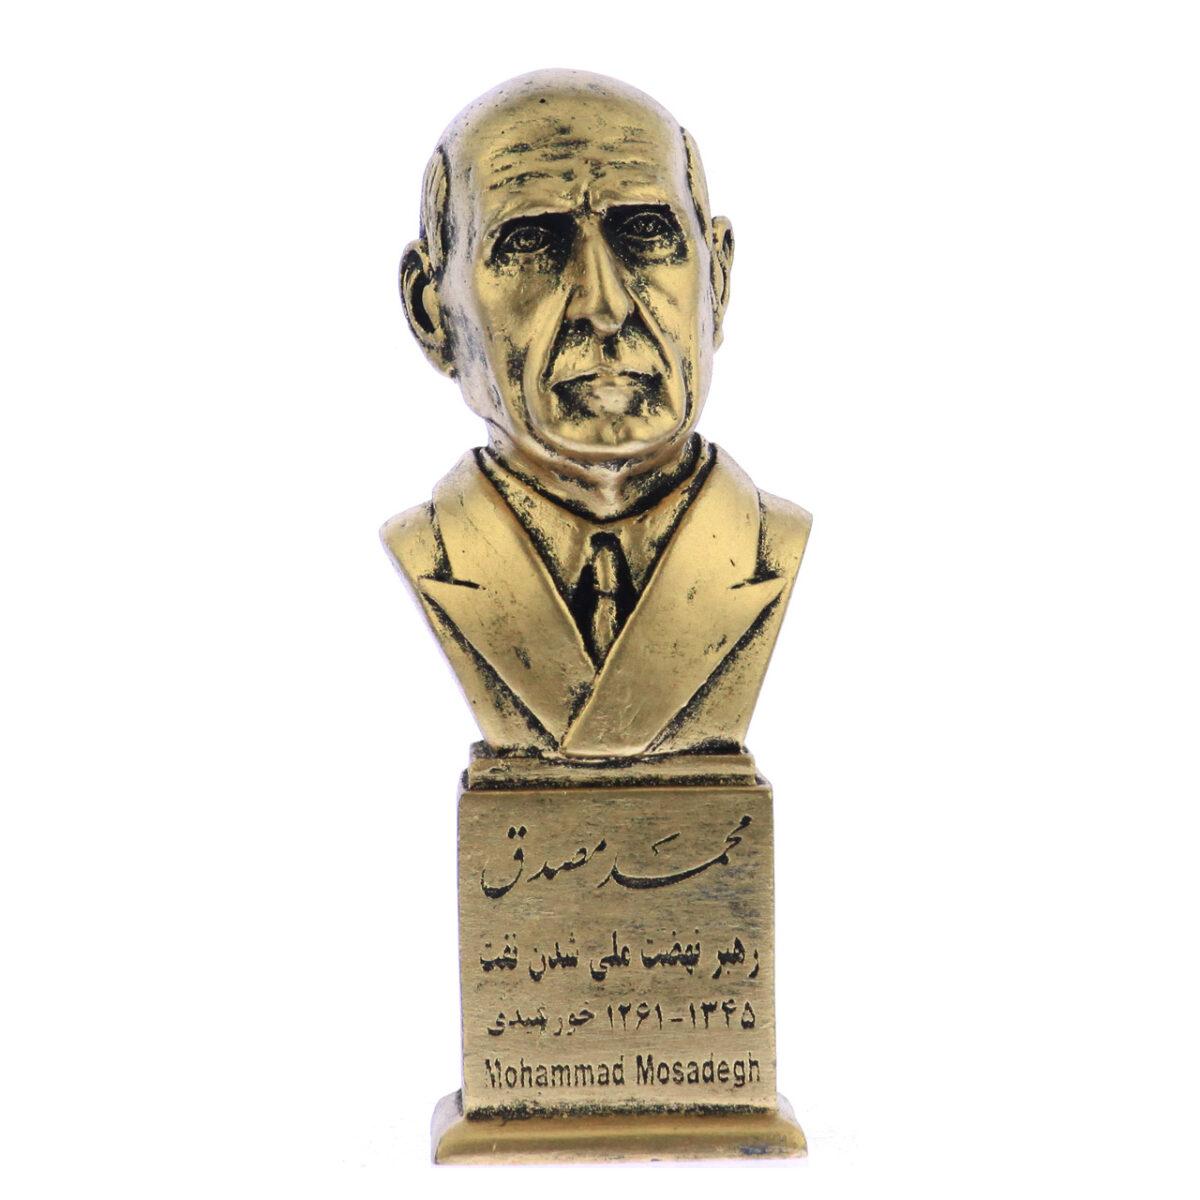 mosadegh b 1200x1200 - سردیس دکتر محمد مصدق